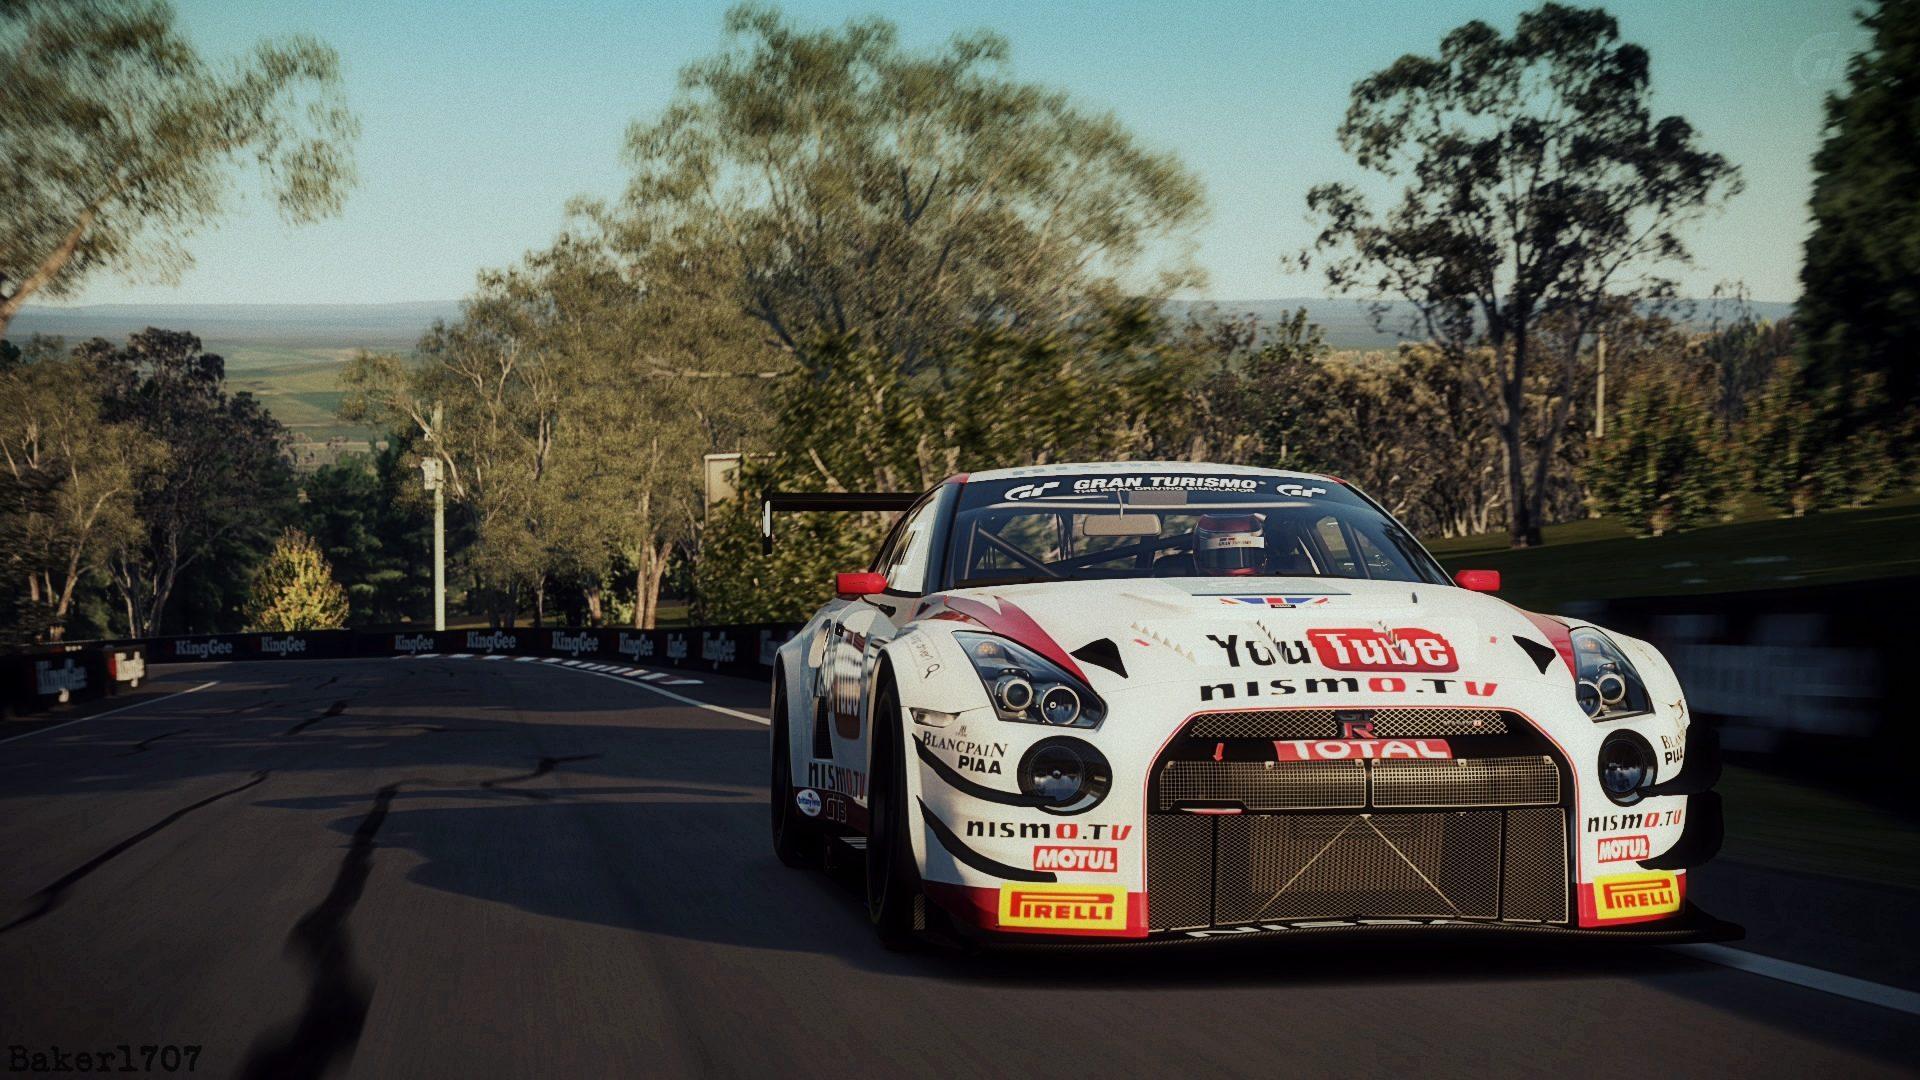 Mount Panorama Motor Racing Circuit_29 edit.jpg